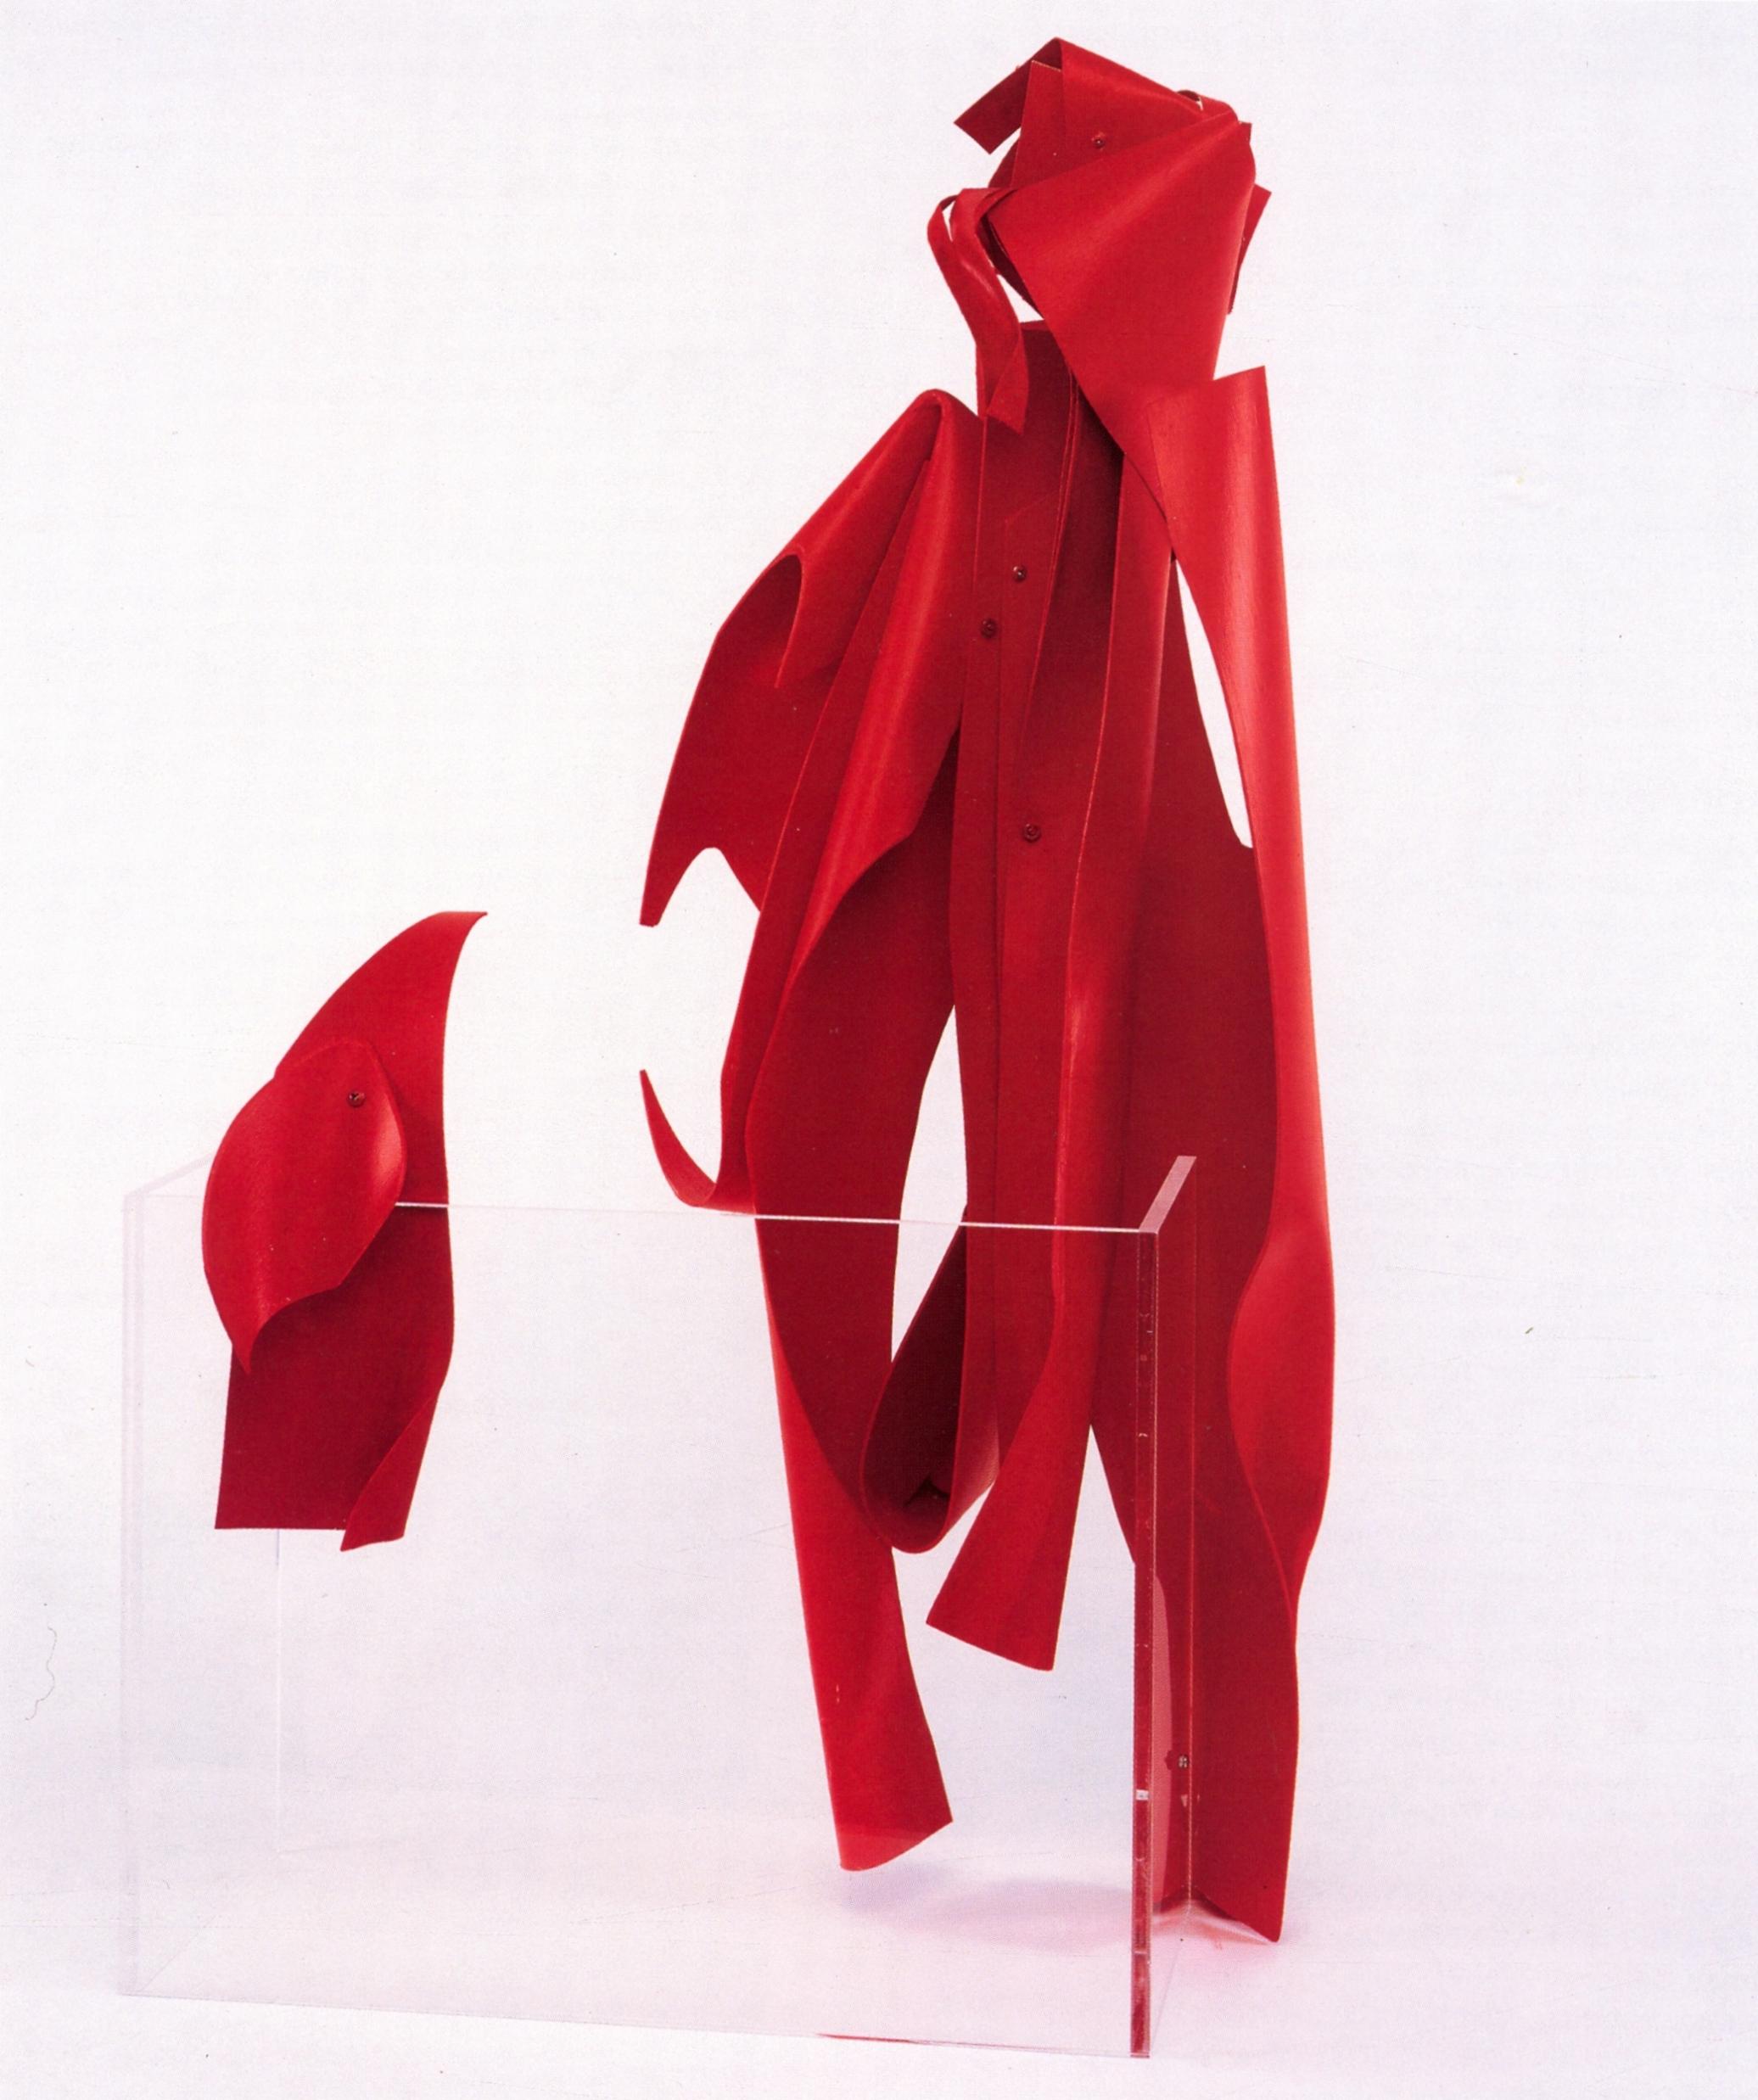 Susan Manspeizer   #1003 Conversations  , Painted wood, plastic, 34'' x 19'' x 18'', 2003